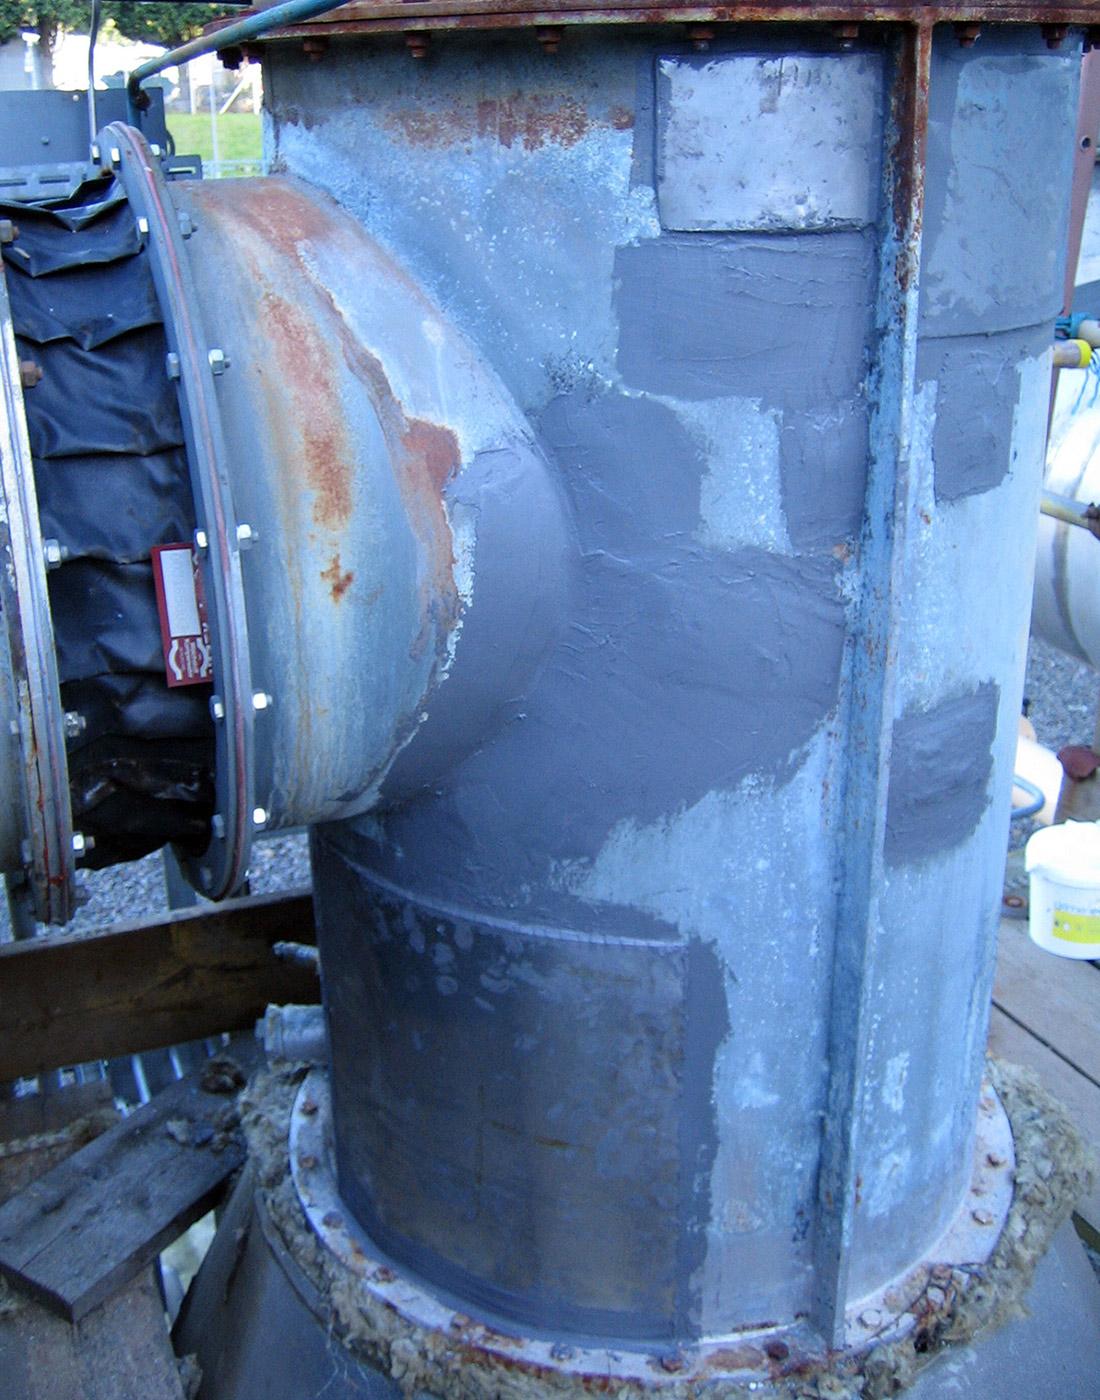 Belzona 1121 (Super XL-Metal) Repair Composite